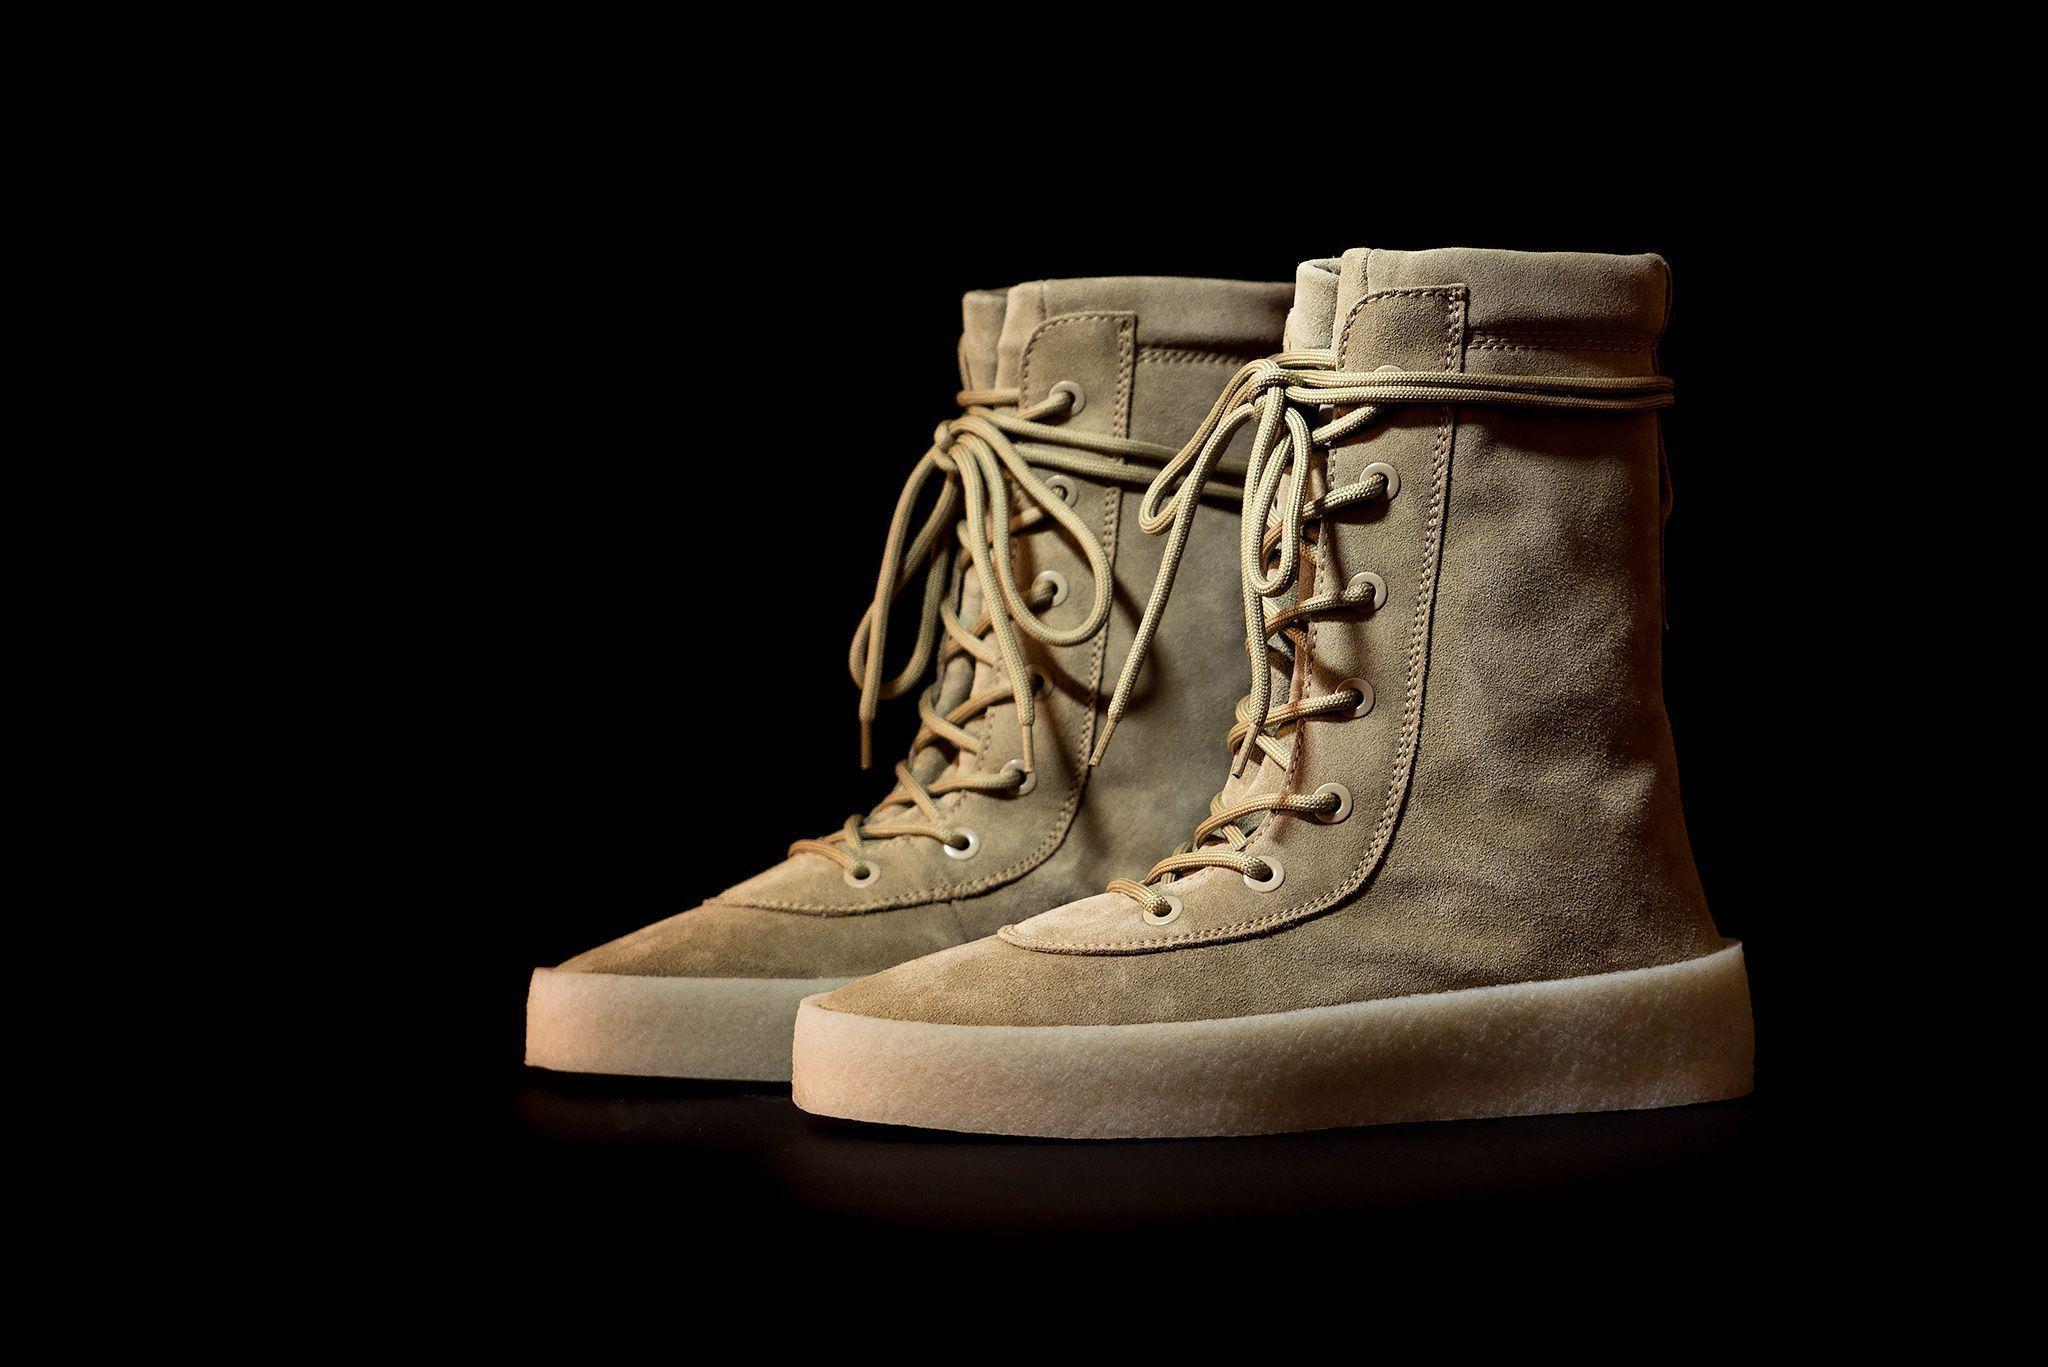 highxtar_boots_aw16_7